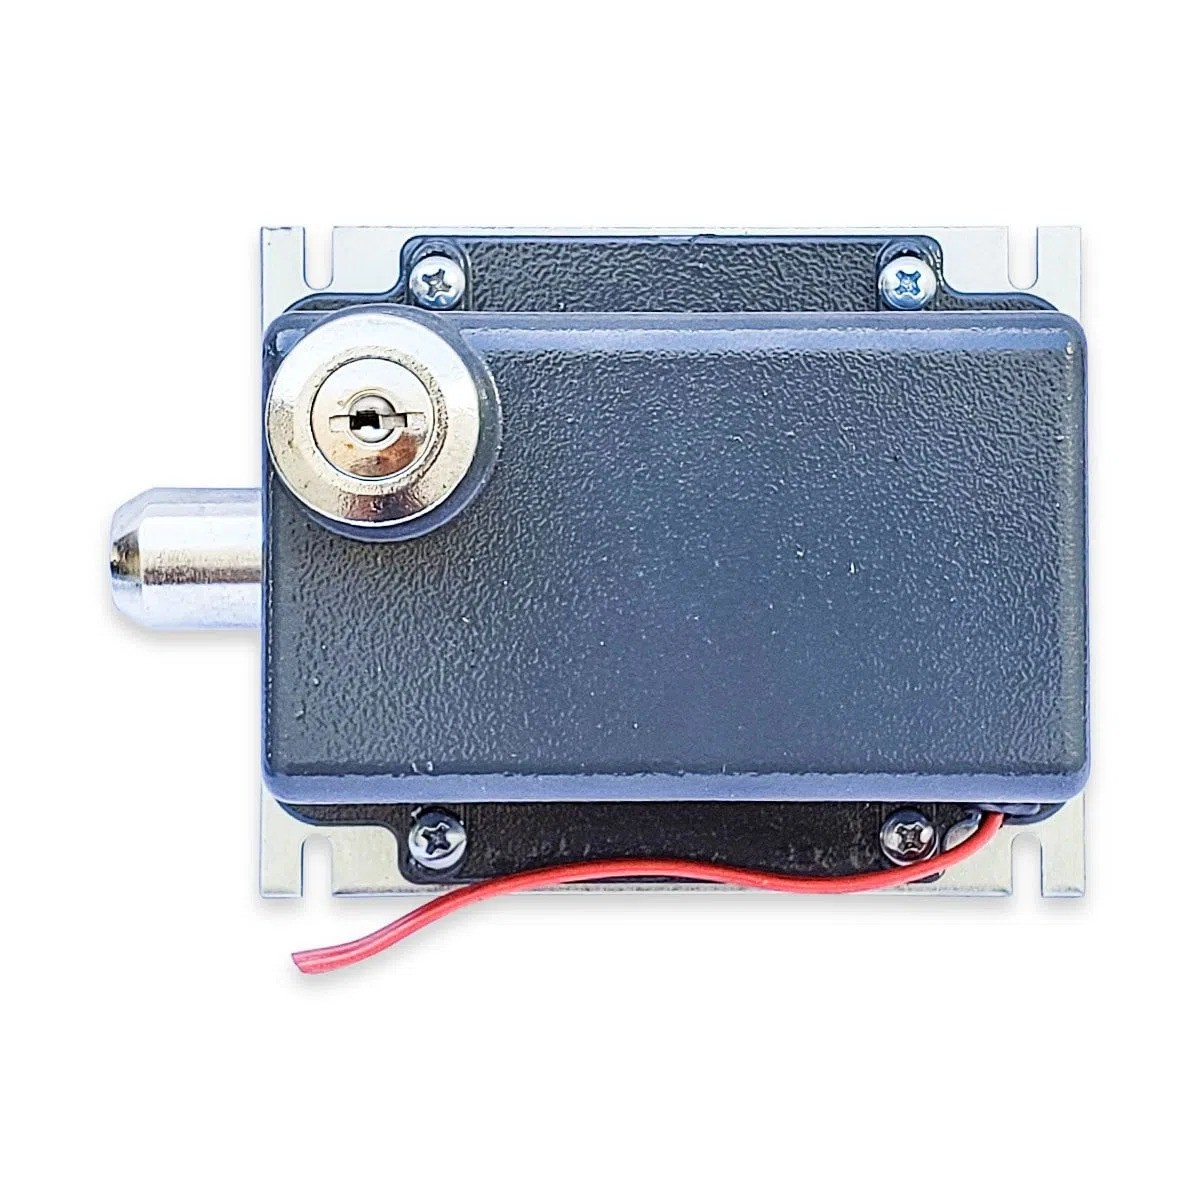 Trava Eletromagnética AGL 220V - Cinza C/ Módulo - 40076